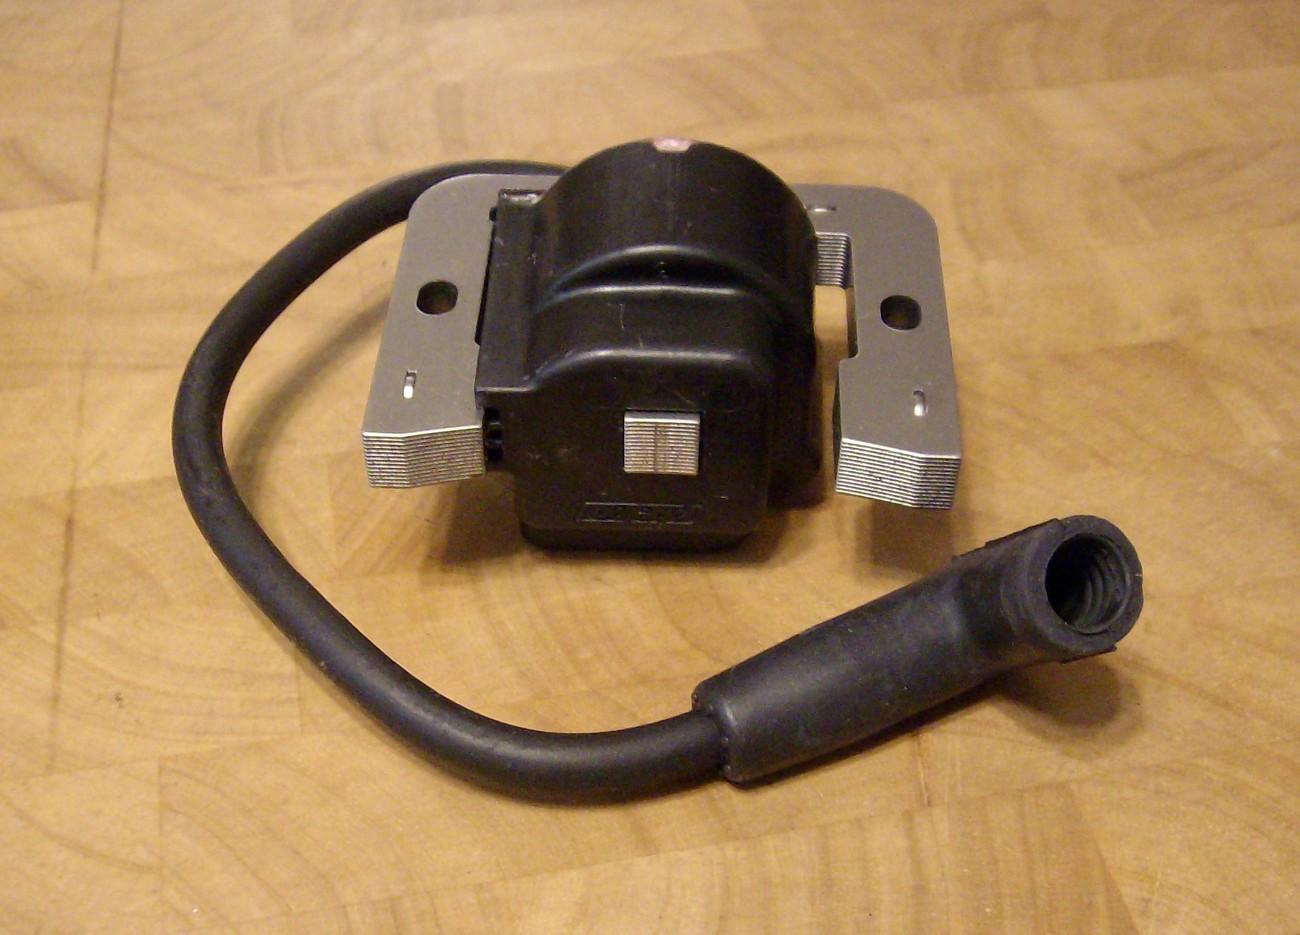 Kohler CH25 CV22 CV22S & CV23 solid state module coil 2458403 / 2458411, 2458415 for sale  USA